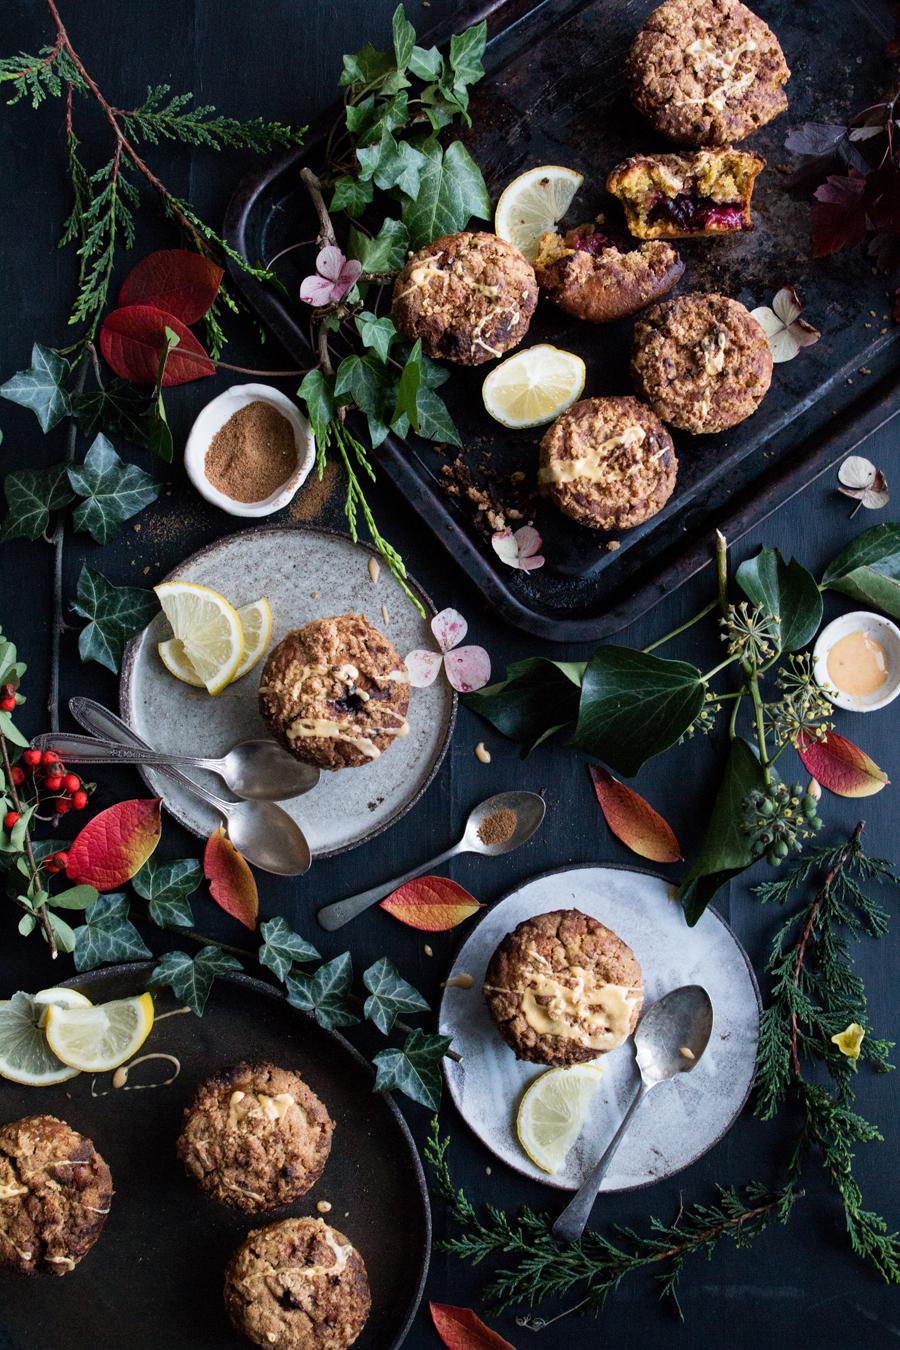 Easyy recipe for pumpkin spiced muffins - The Little Plantation